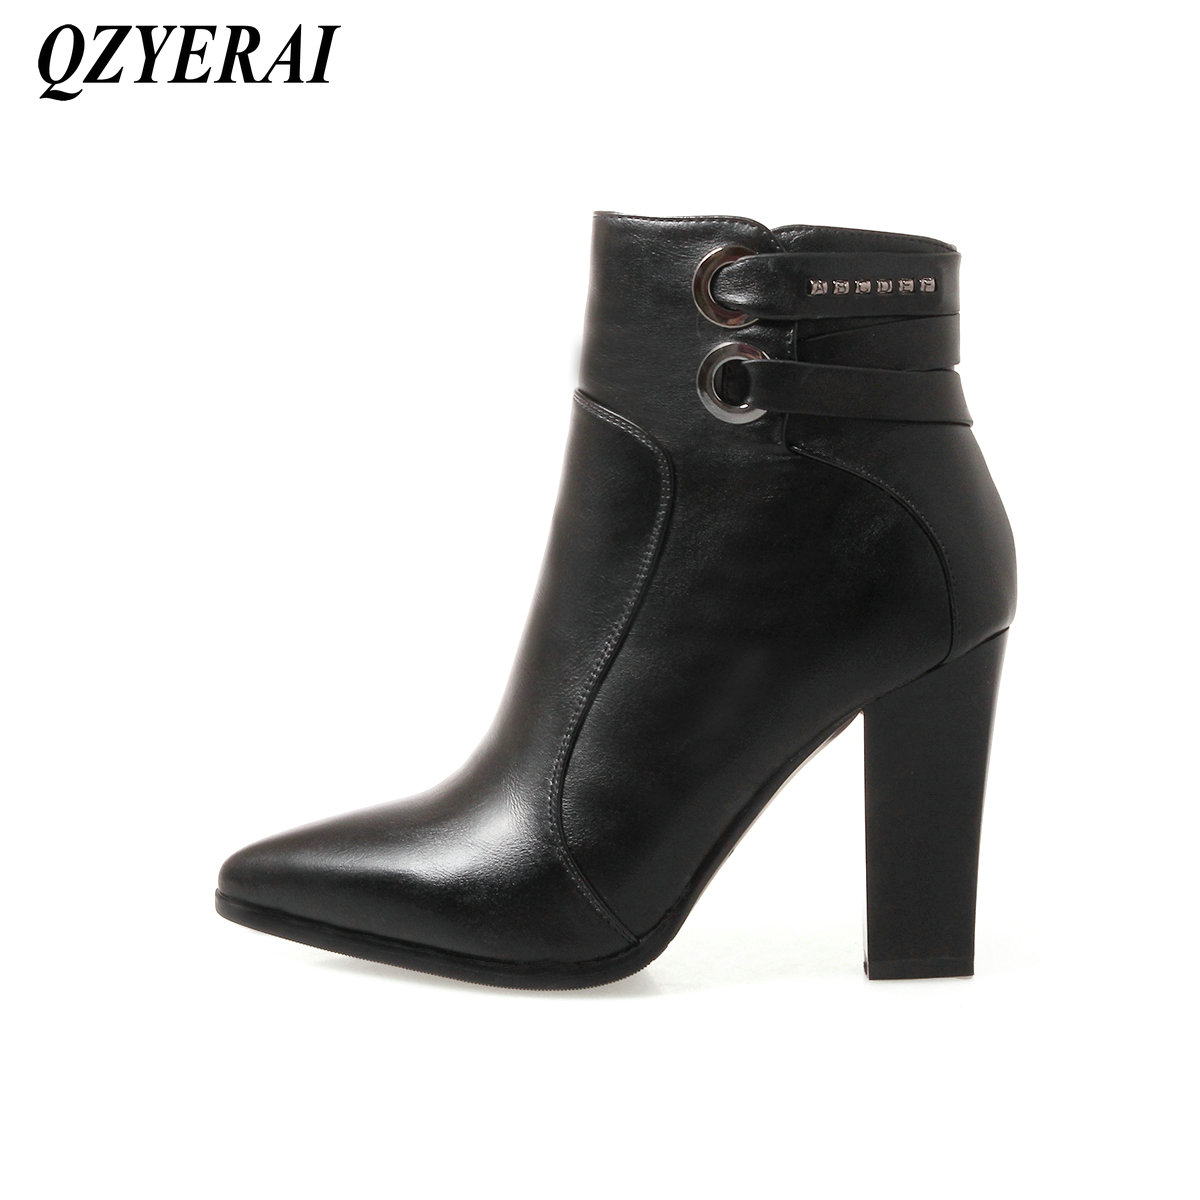 QZYERAI Winter pointed fashion ladies short boots patent leather font b womens b font font b